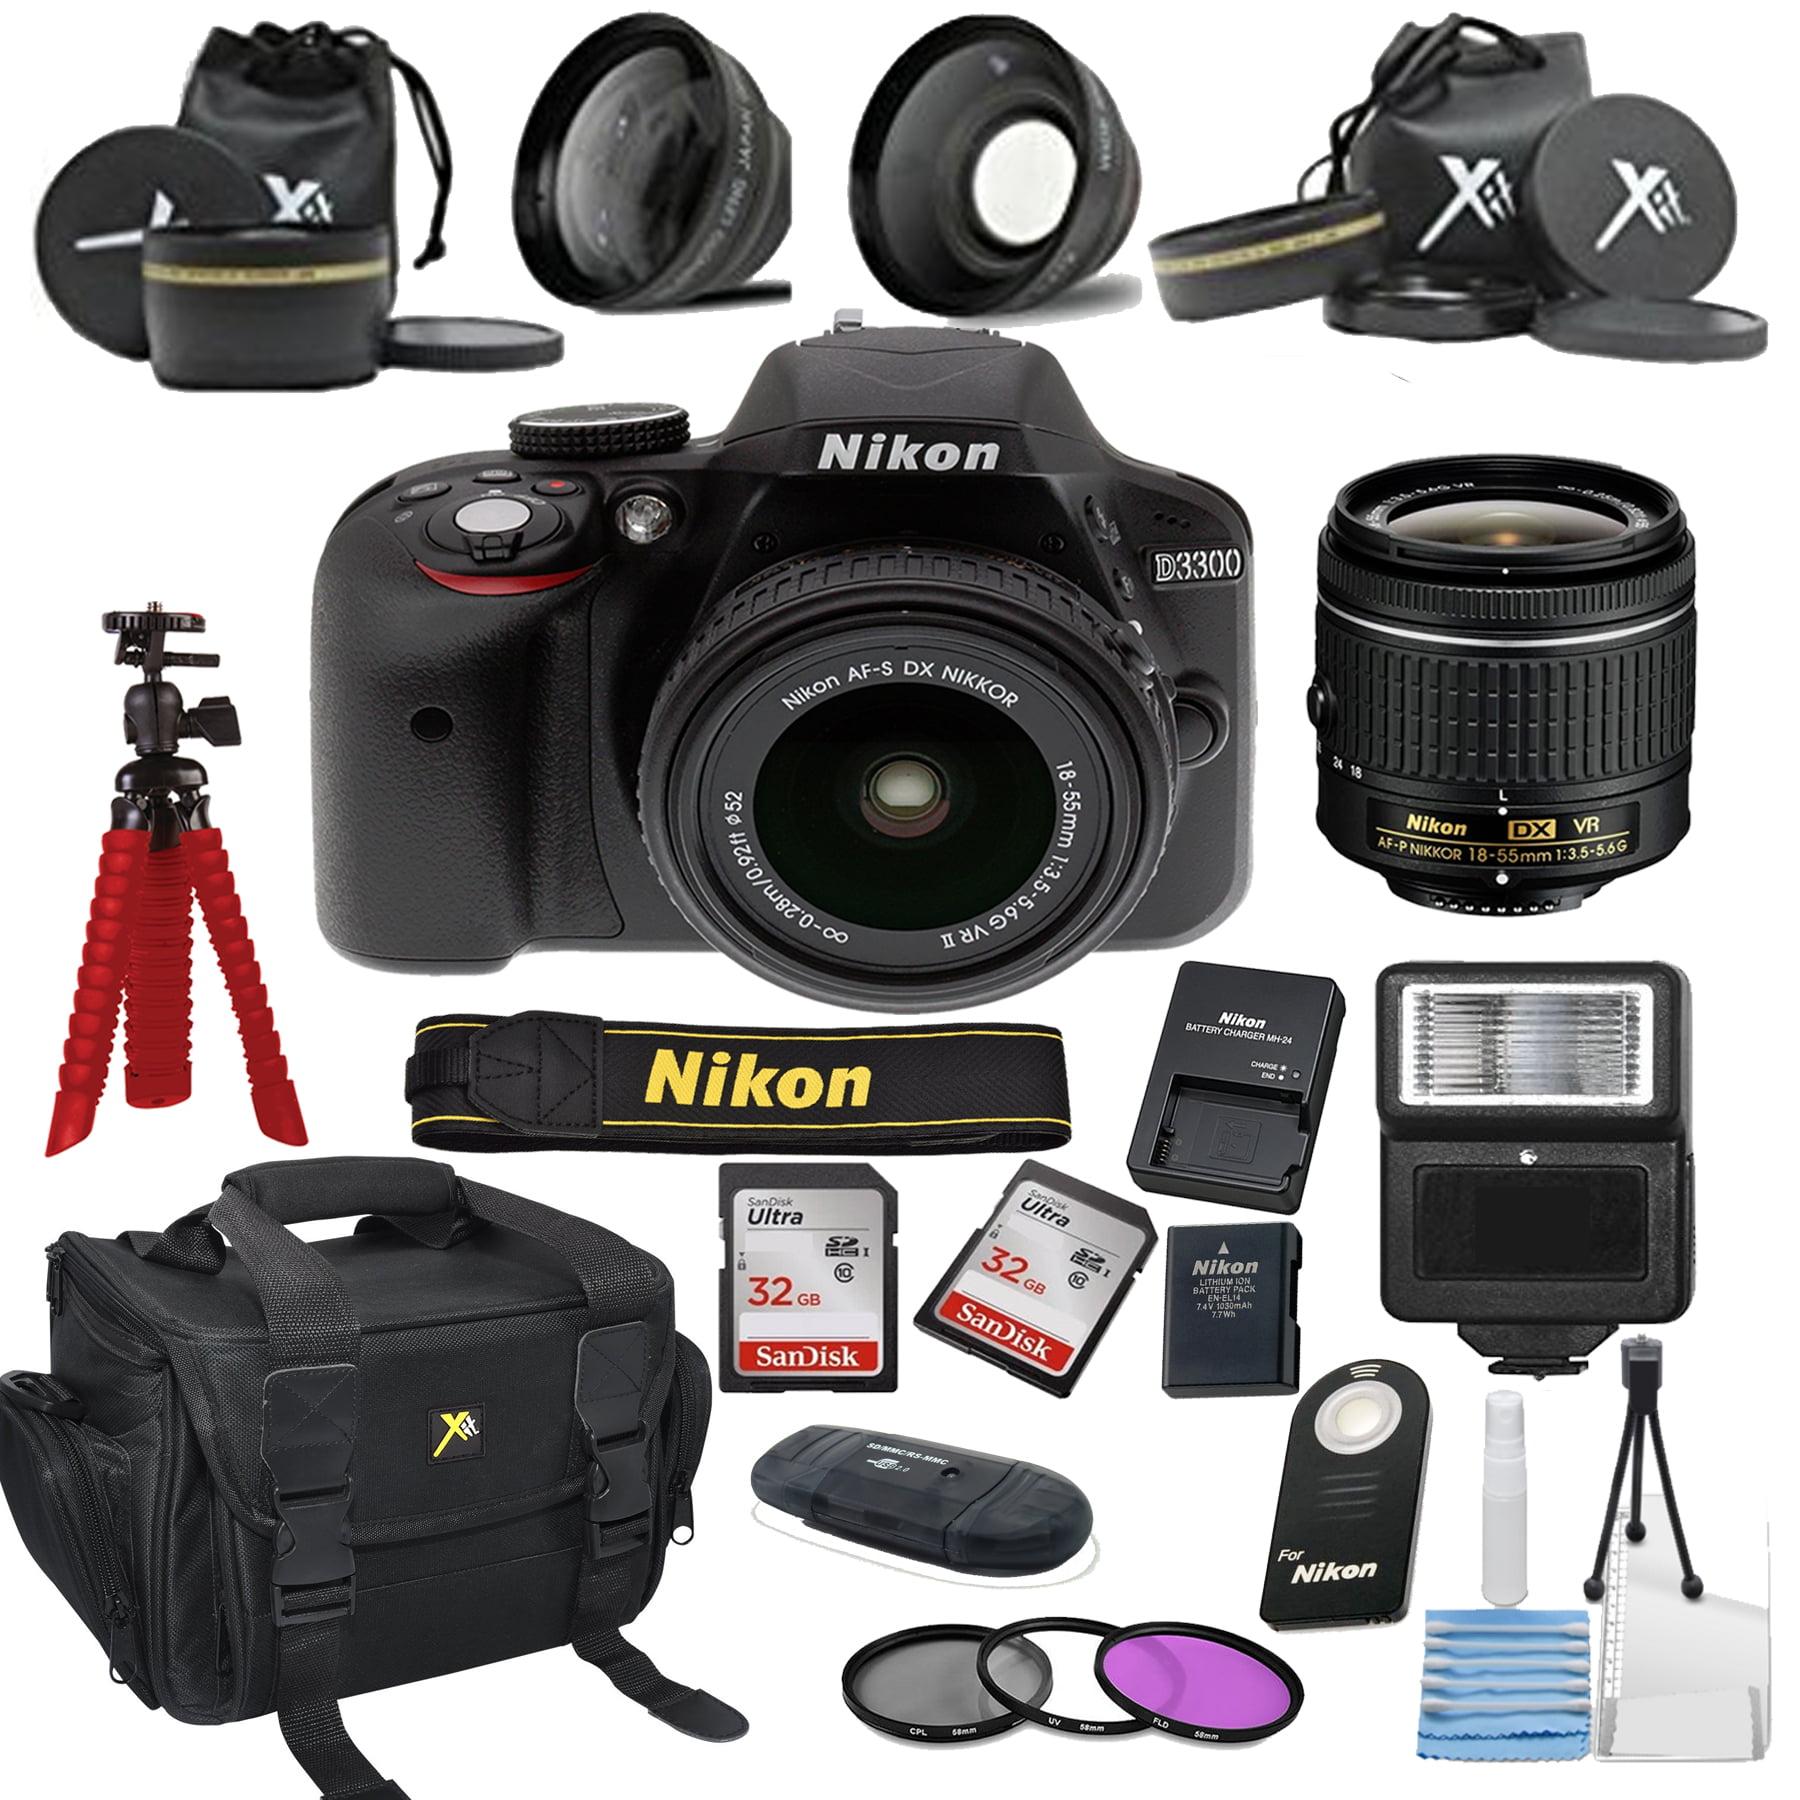 Nikon D3300 24.2 MP DSLR Camera + 18-55mm VR Lens Kit + Accessory Bundle + 2X 32GB Memory + Camera Gadget Bag + Wide Angle Lens + 2x Telephoto Lens + Flash + Remote + Tripod + Filters  + More